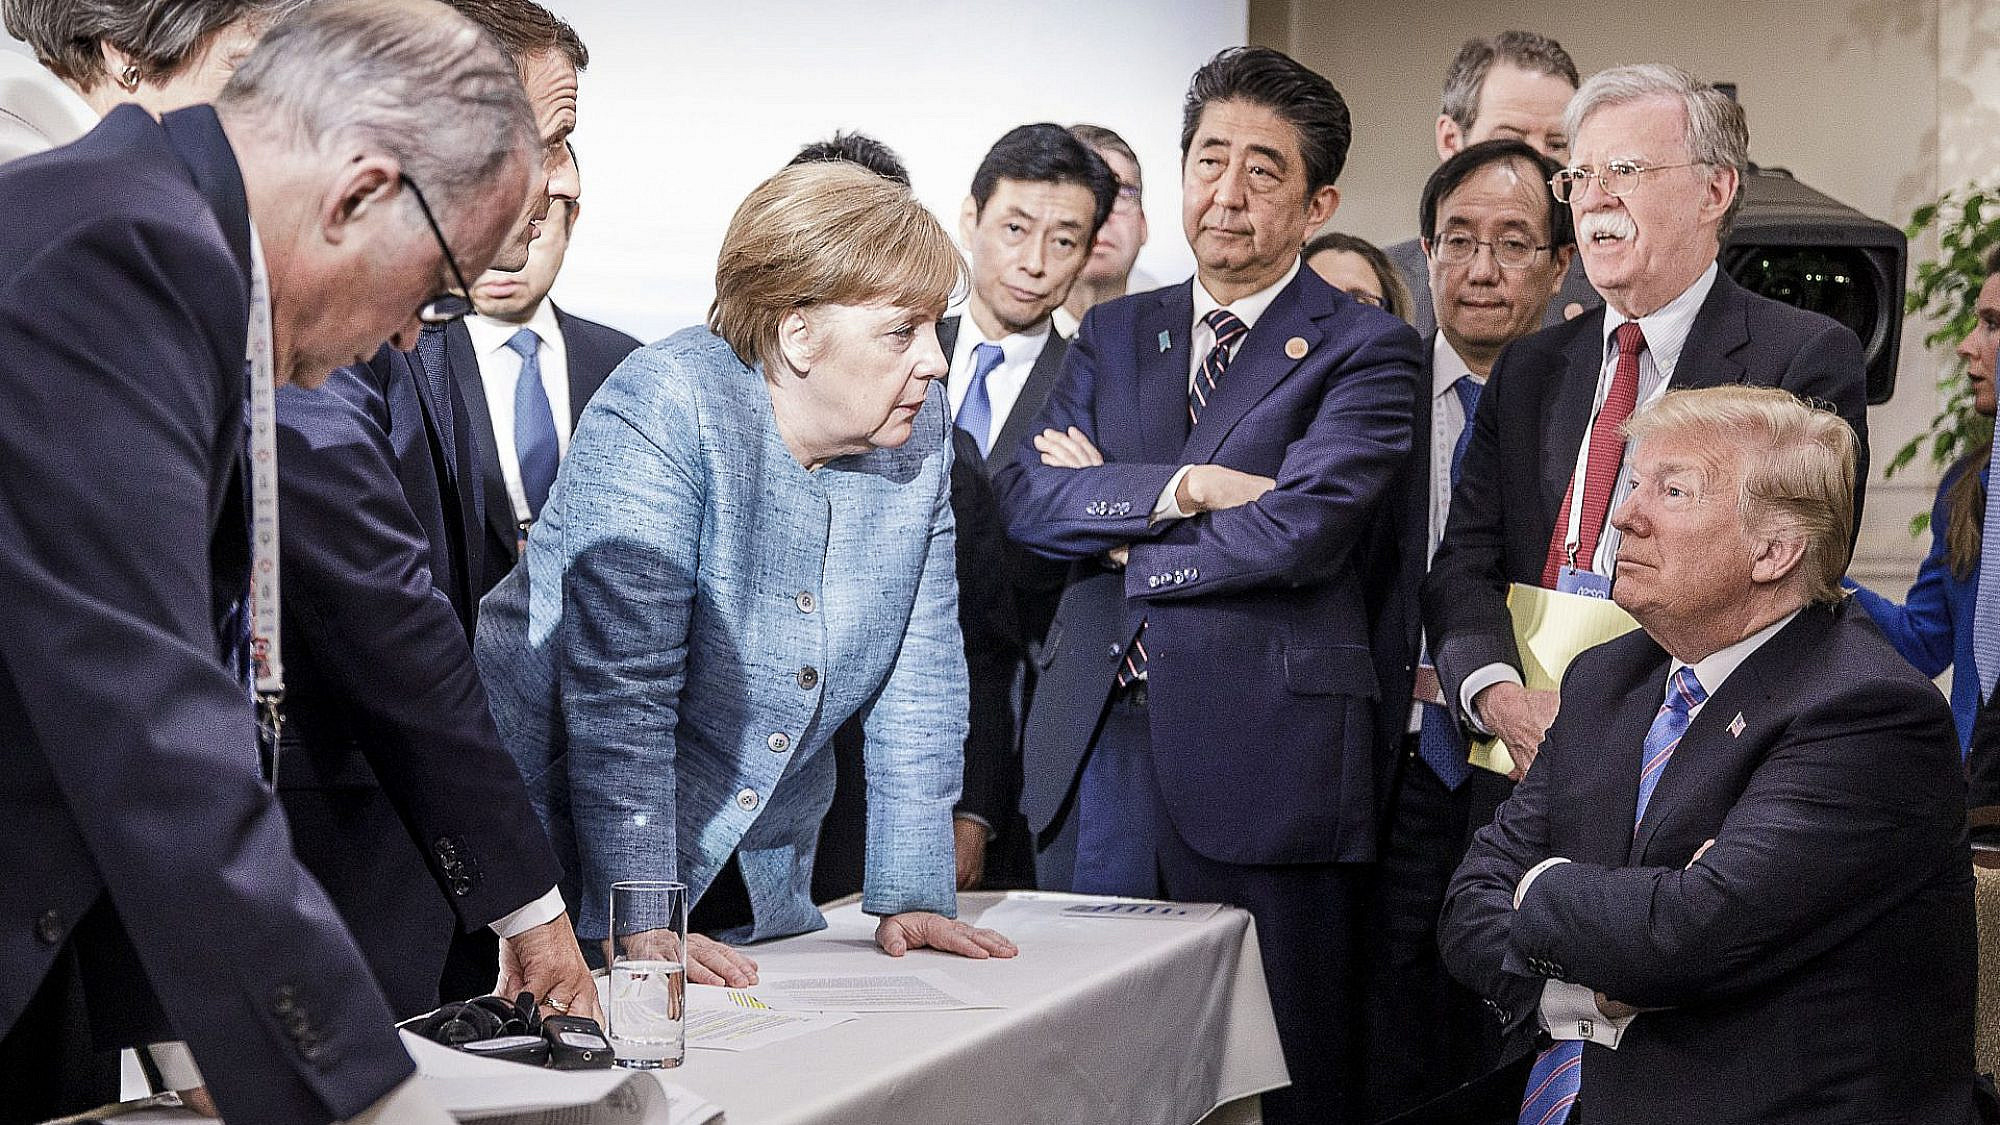 אנגלה מרקל בכנס G7 | צילום: Jesco Denzel /Bundesregierung via Getty Images